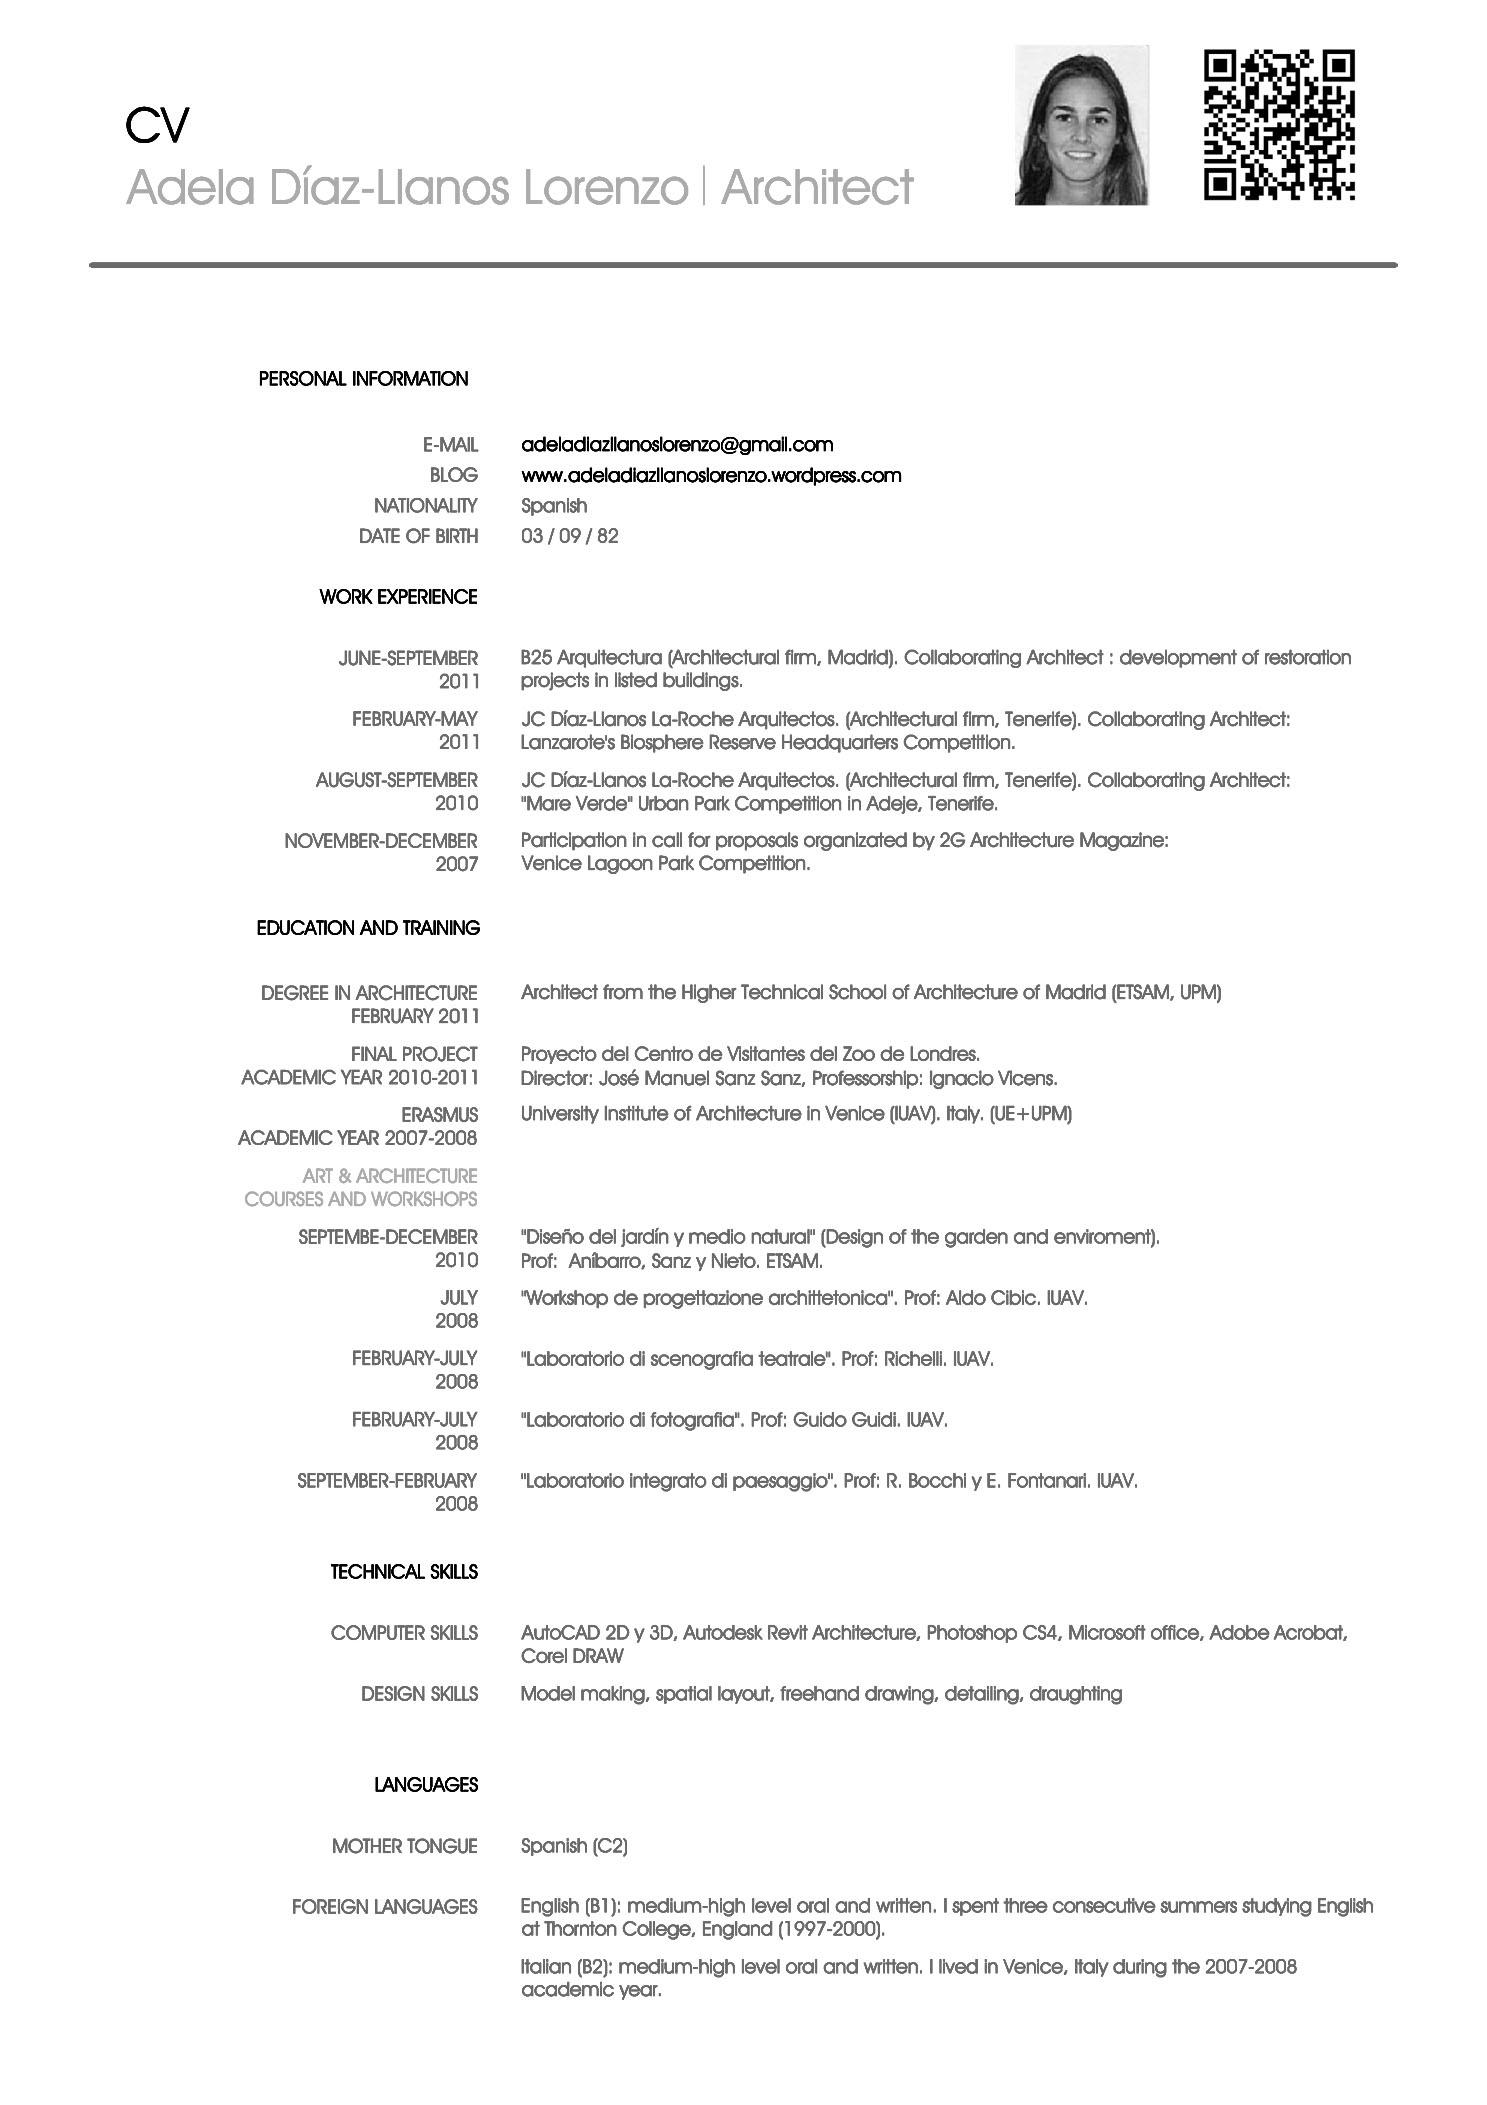 nursing curriculum vitae template professional resume nursing curriculum vitae template standard format for curriculum vitae ahpra pin curriculum vitae samples nursing